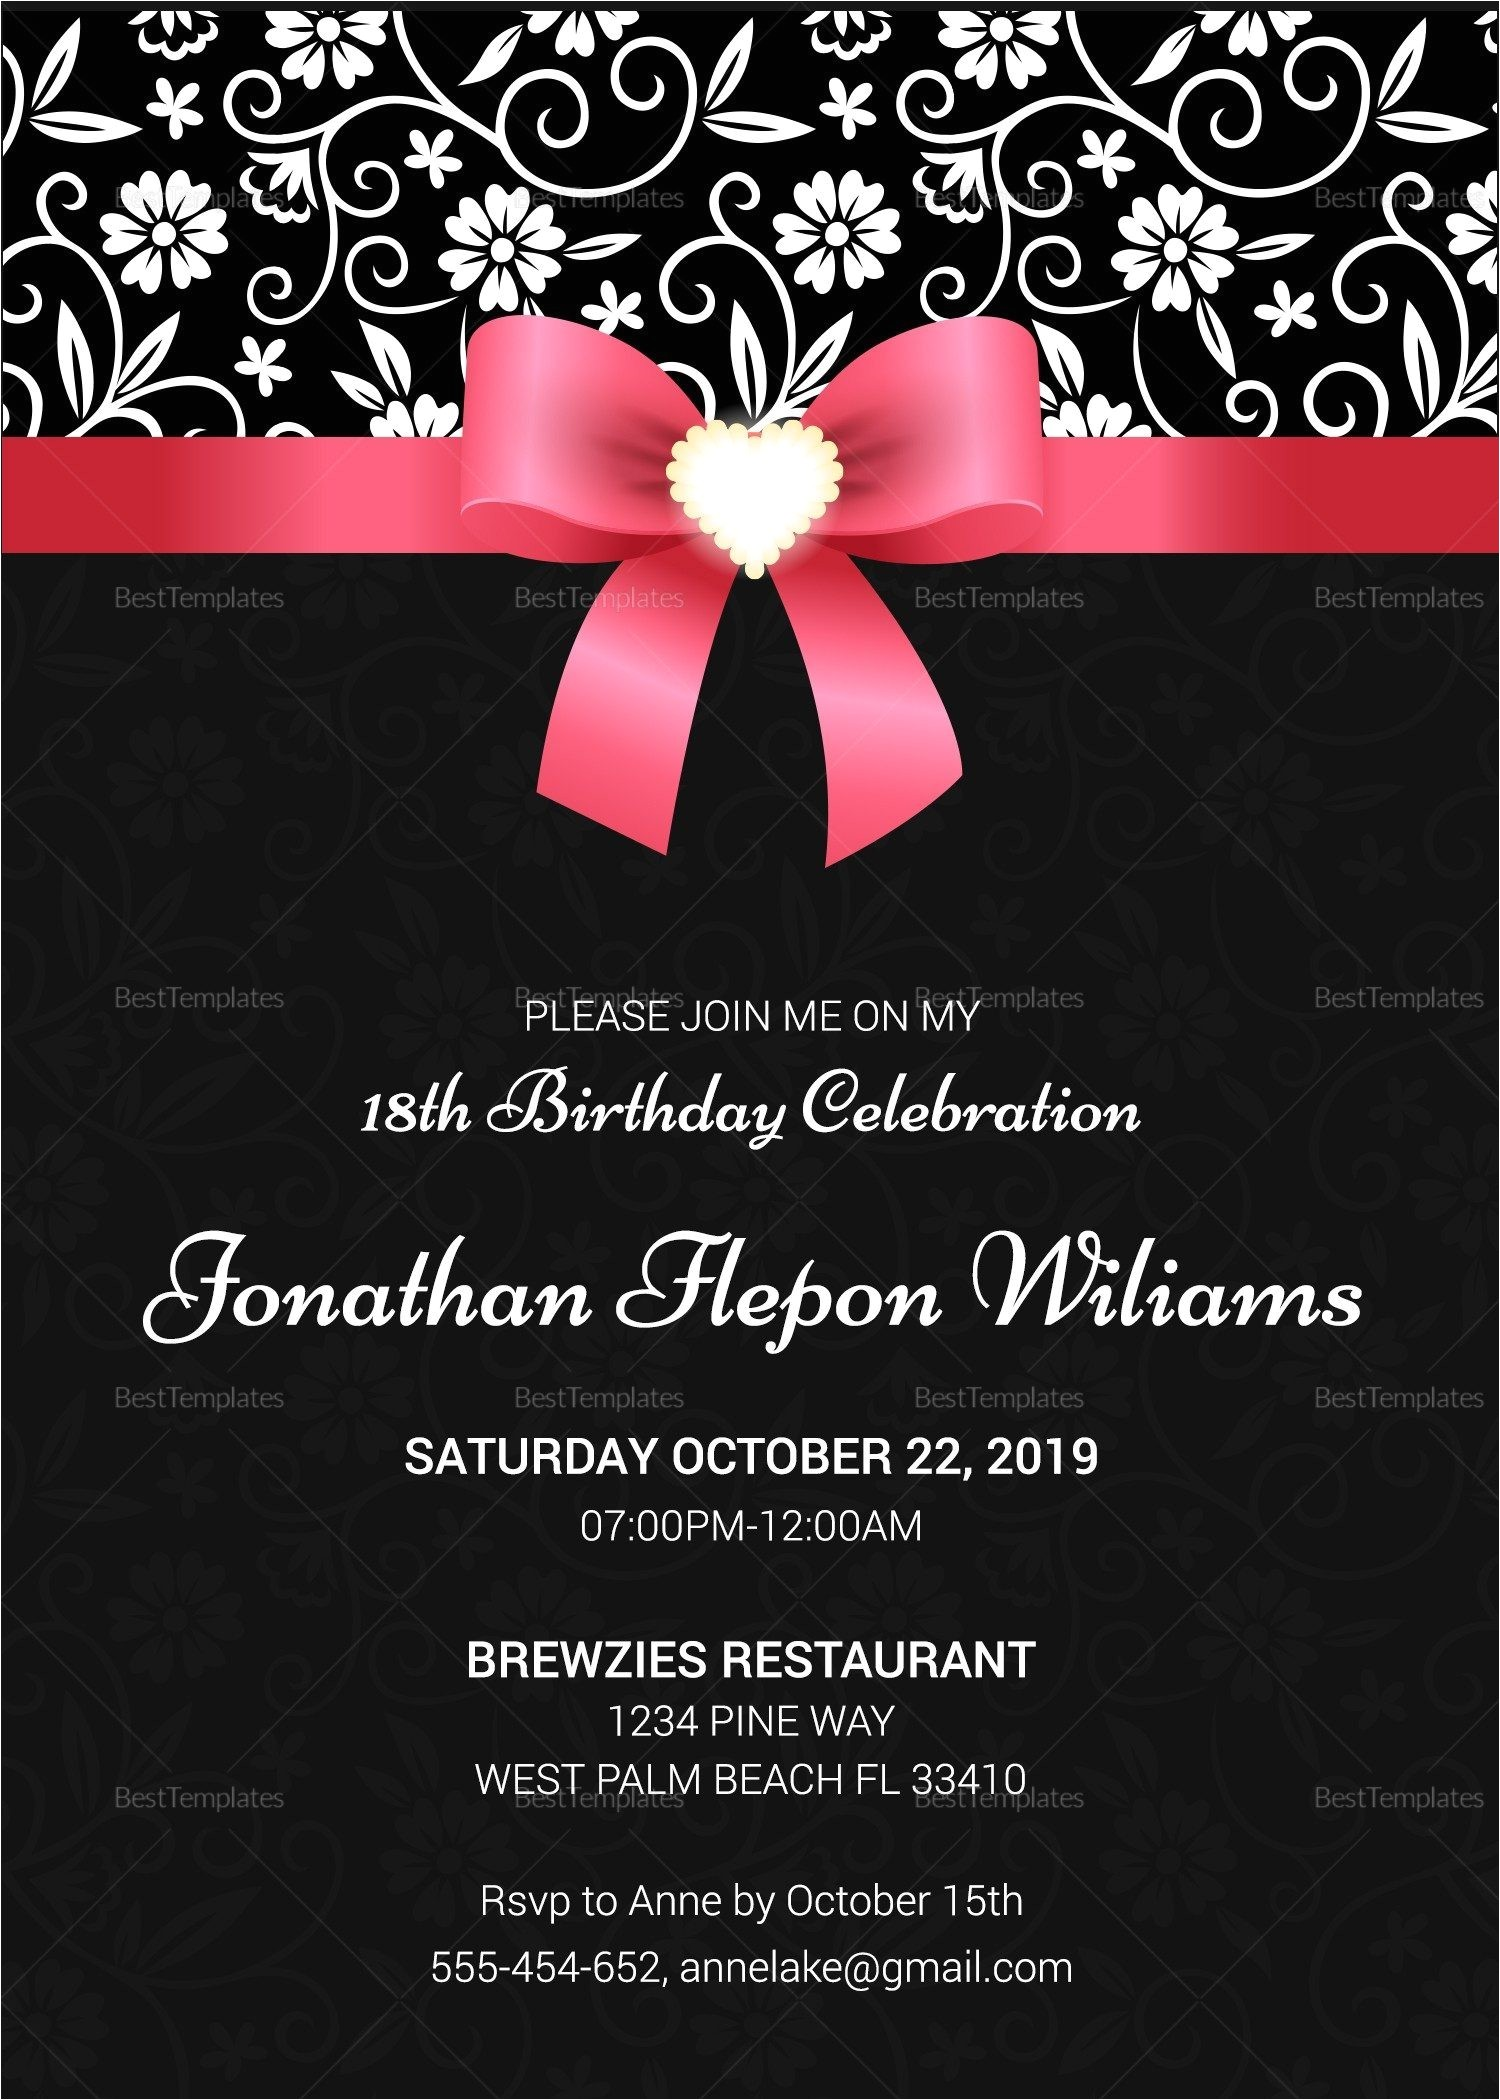 invitation templates for 18th birthday party fresh 18th birthday party invitation templates free download invitation